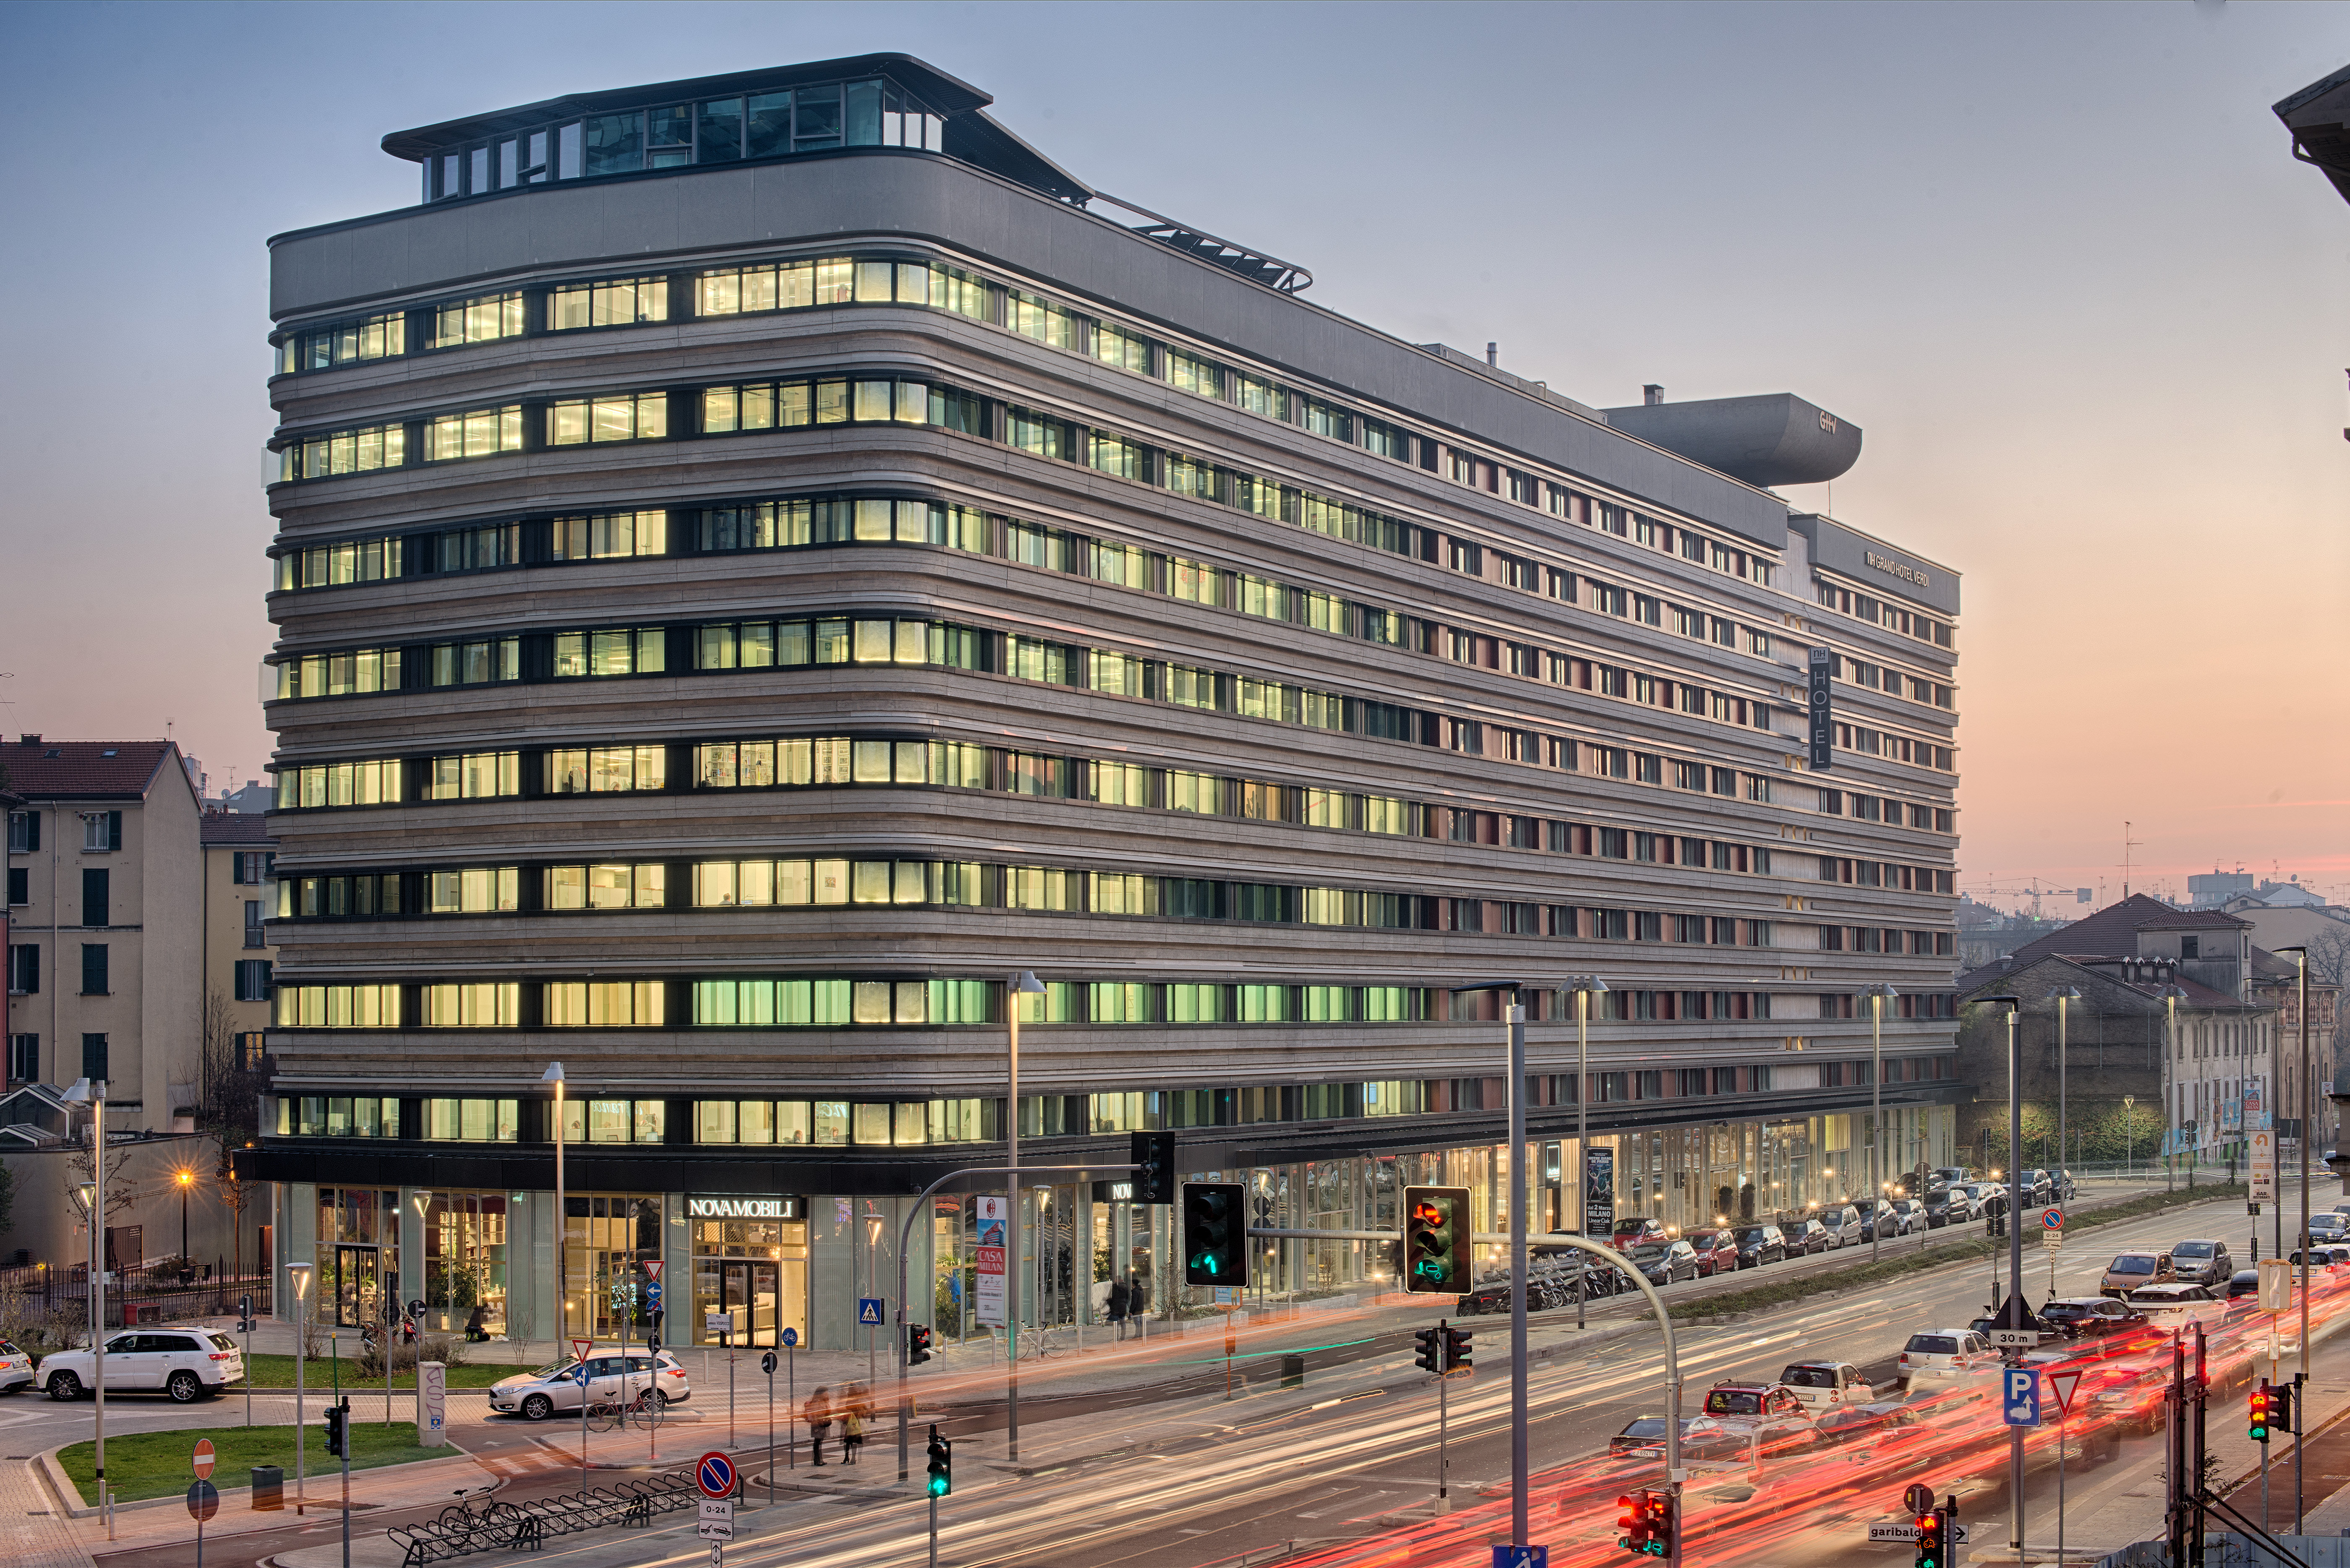 Hotel Mailand Top Hotels Gunstig Bei Hrs Buchen